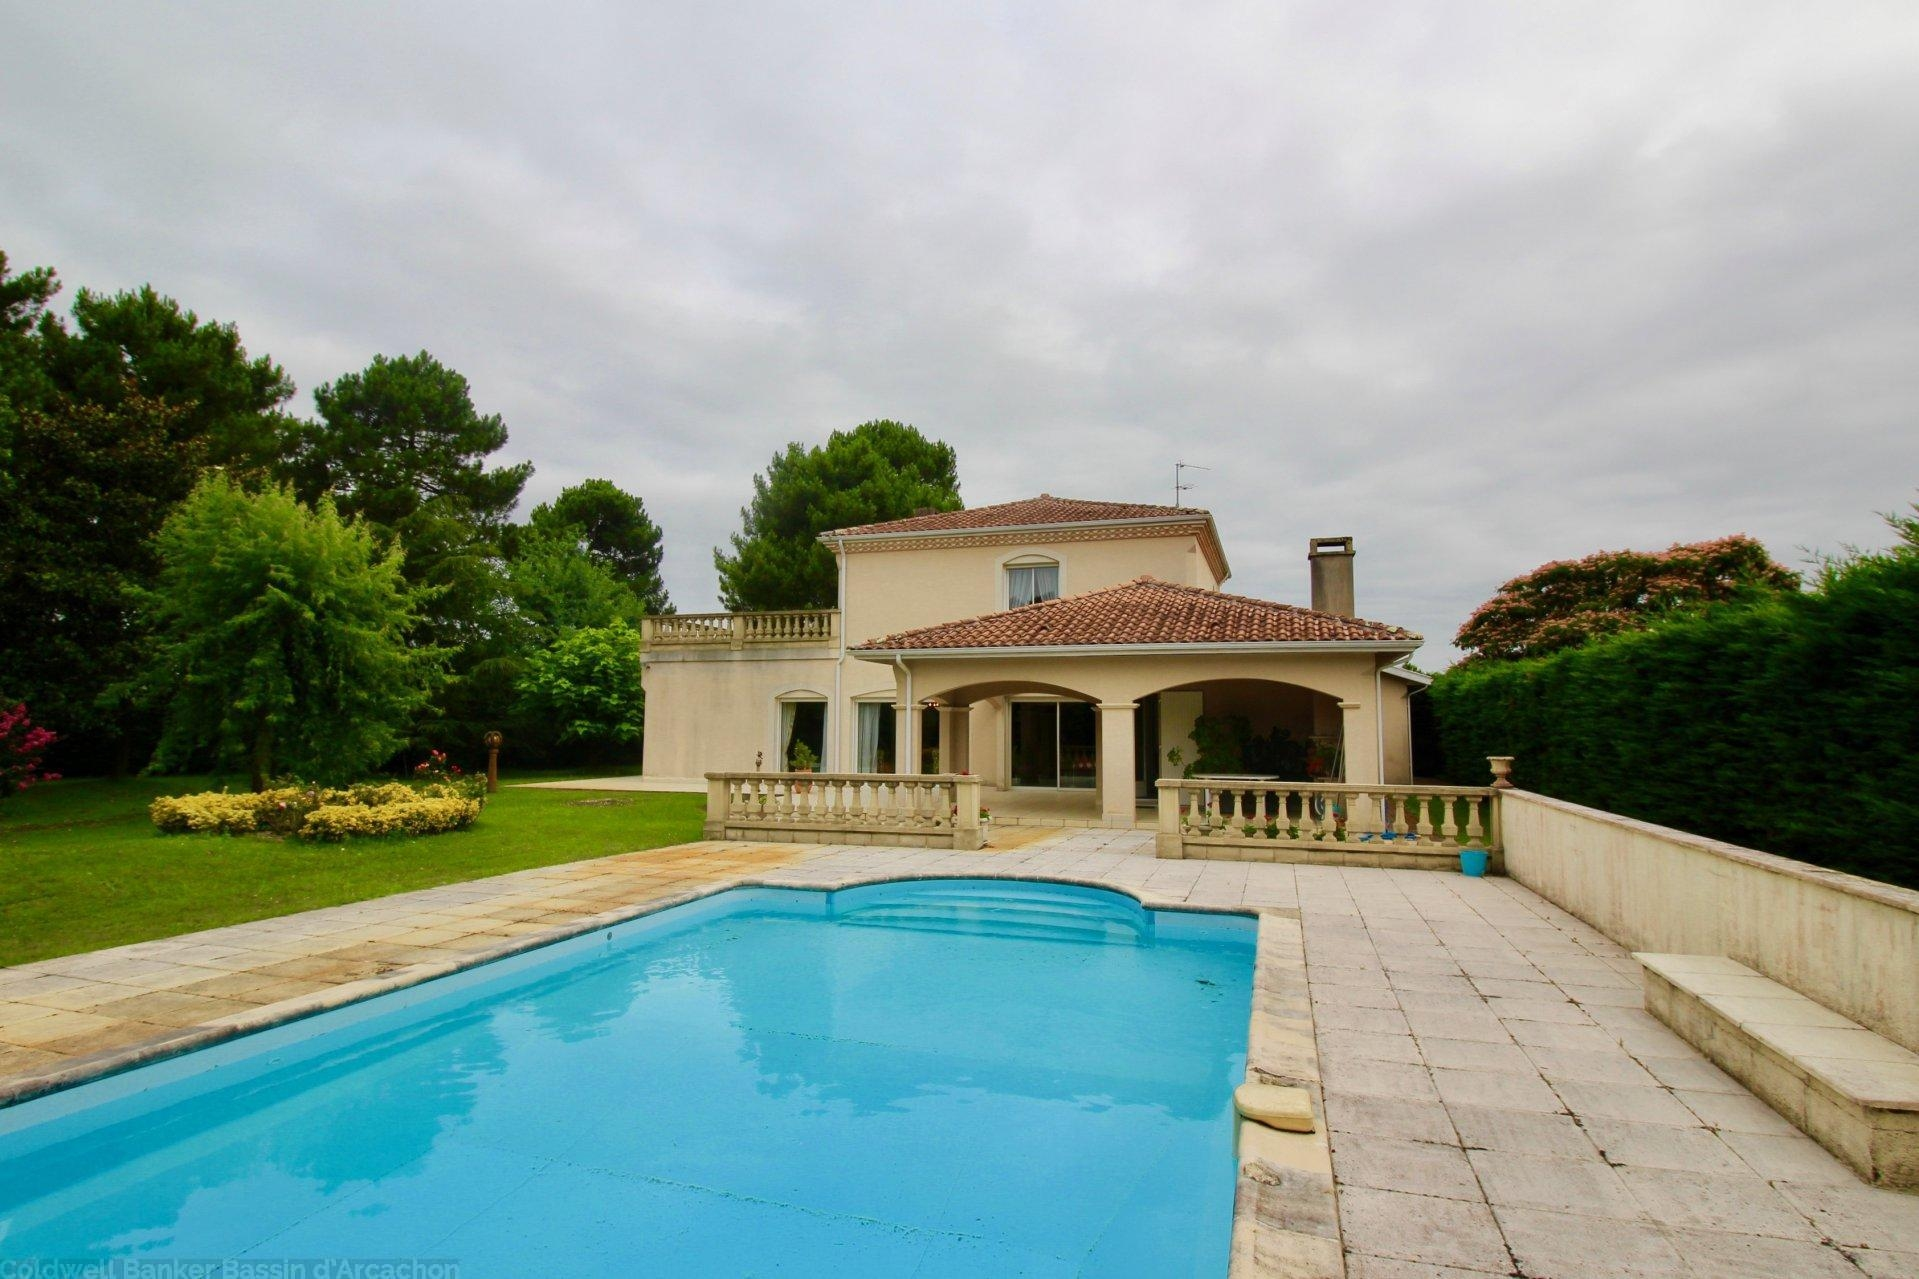 NEAR BORDEAUX   PESSAC   Magnificent Villa With Swimming Pool